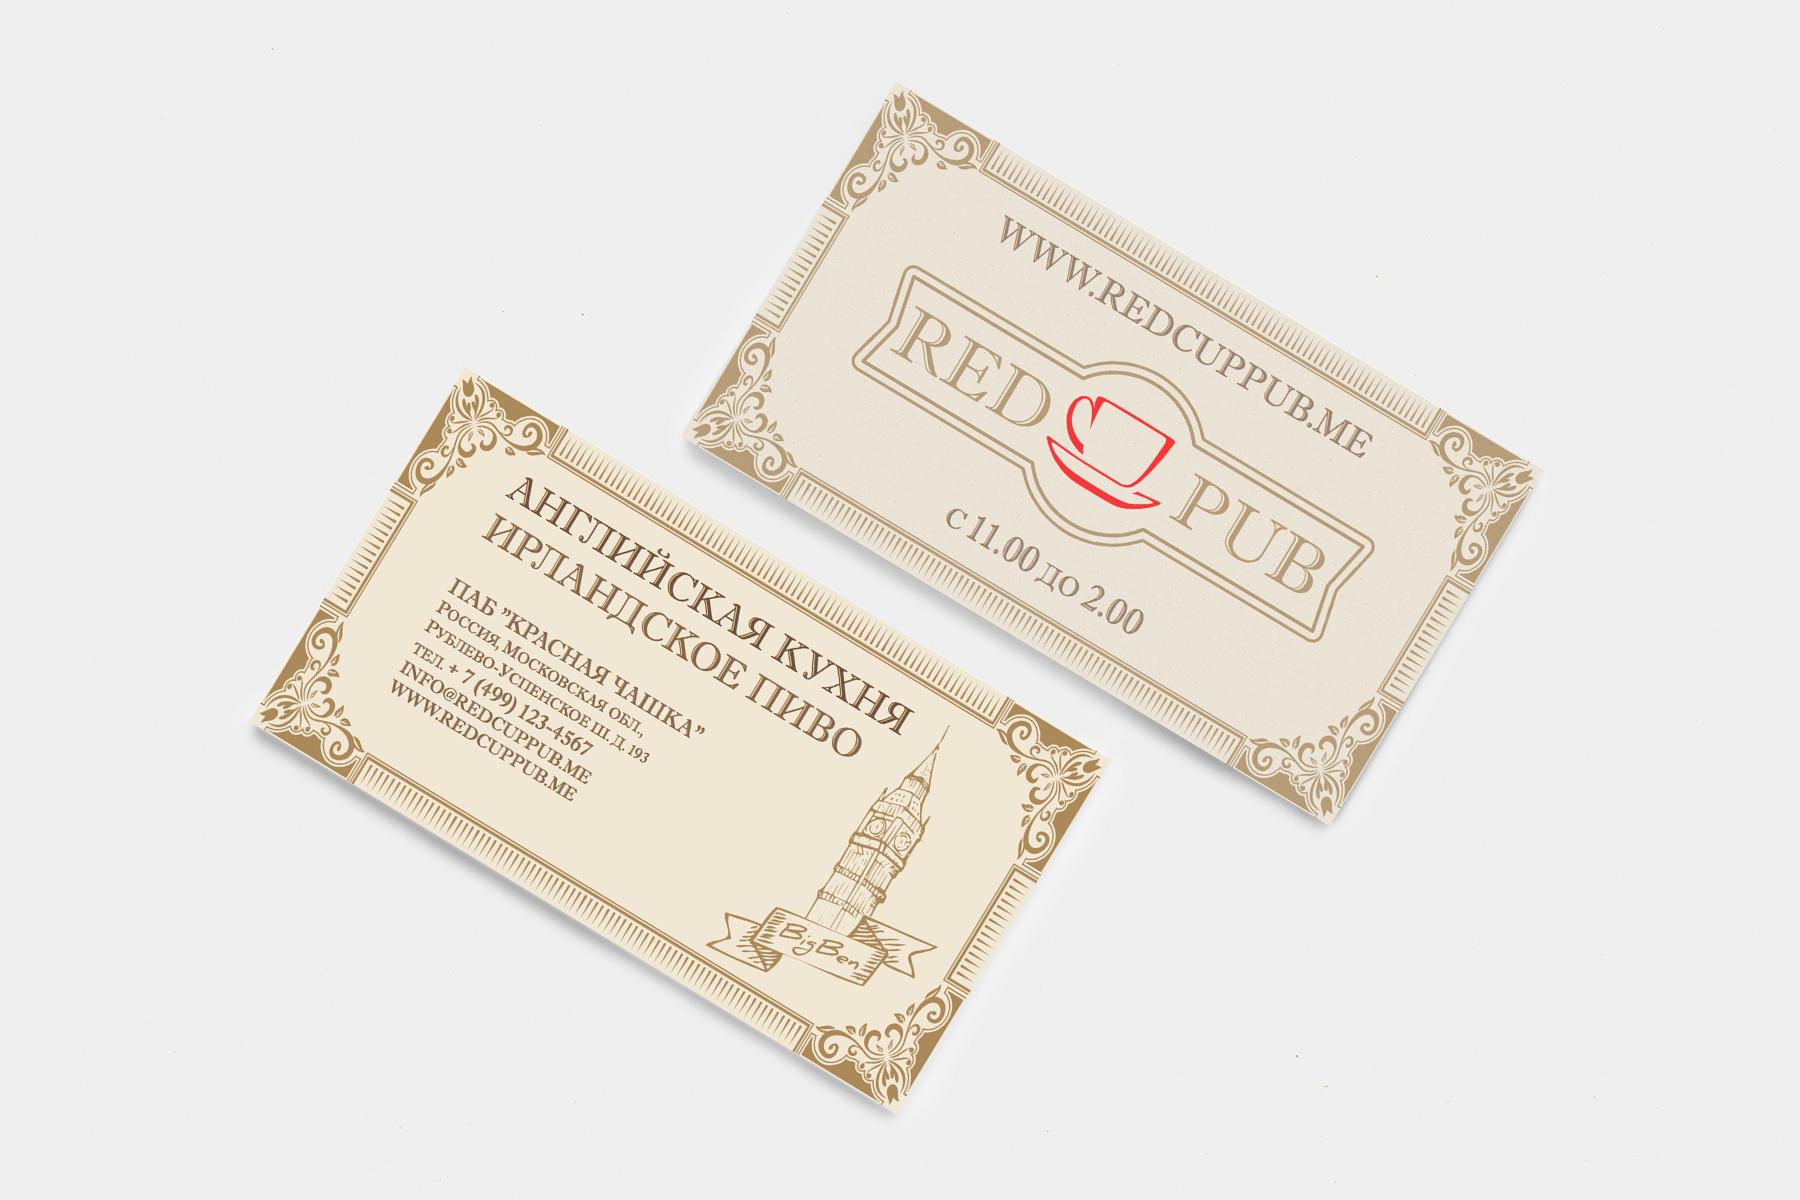 Визитная карточка Red Cup Pub - общий вид